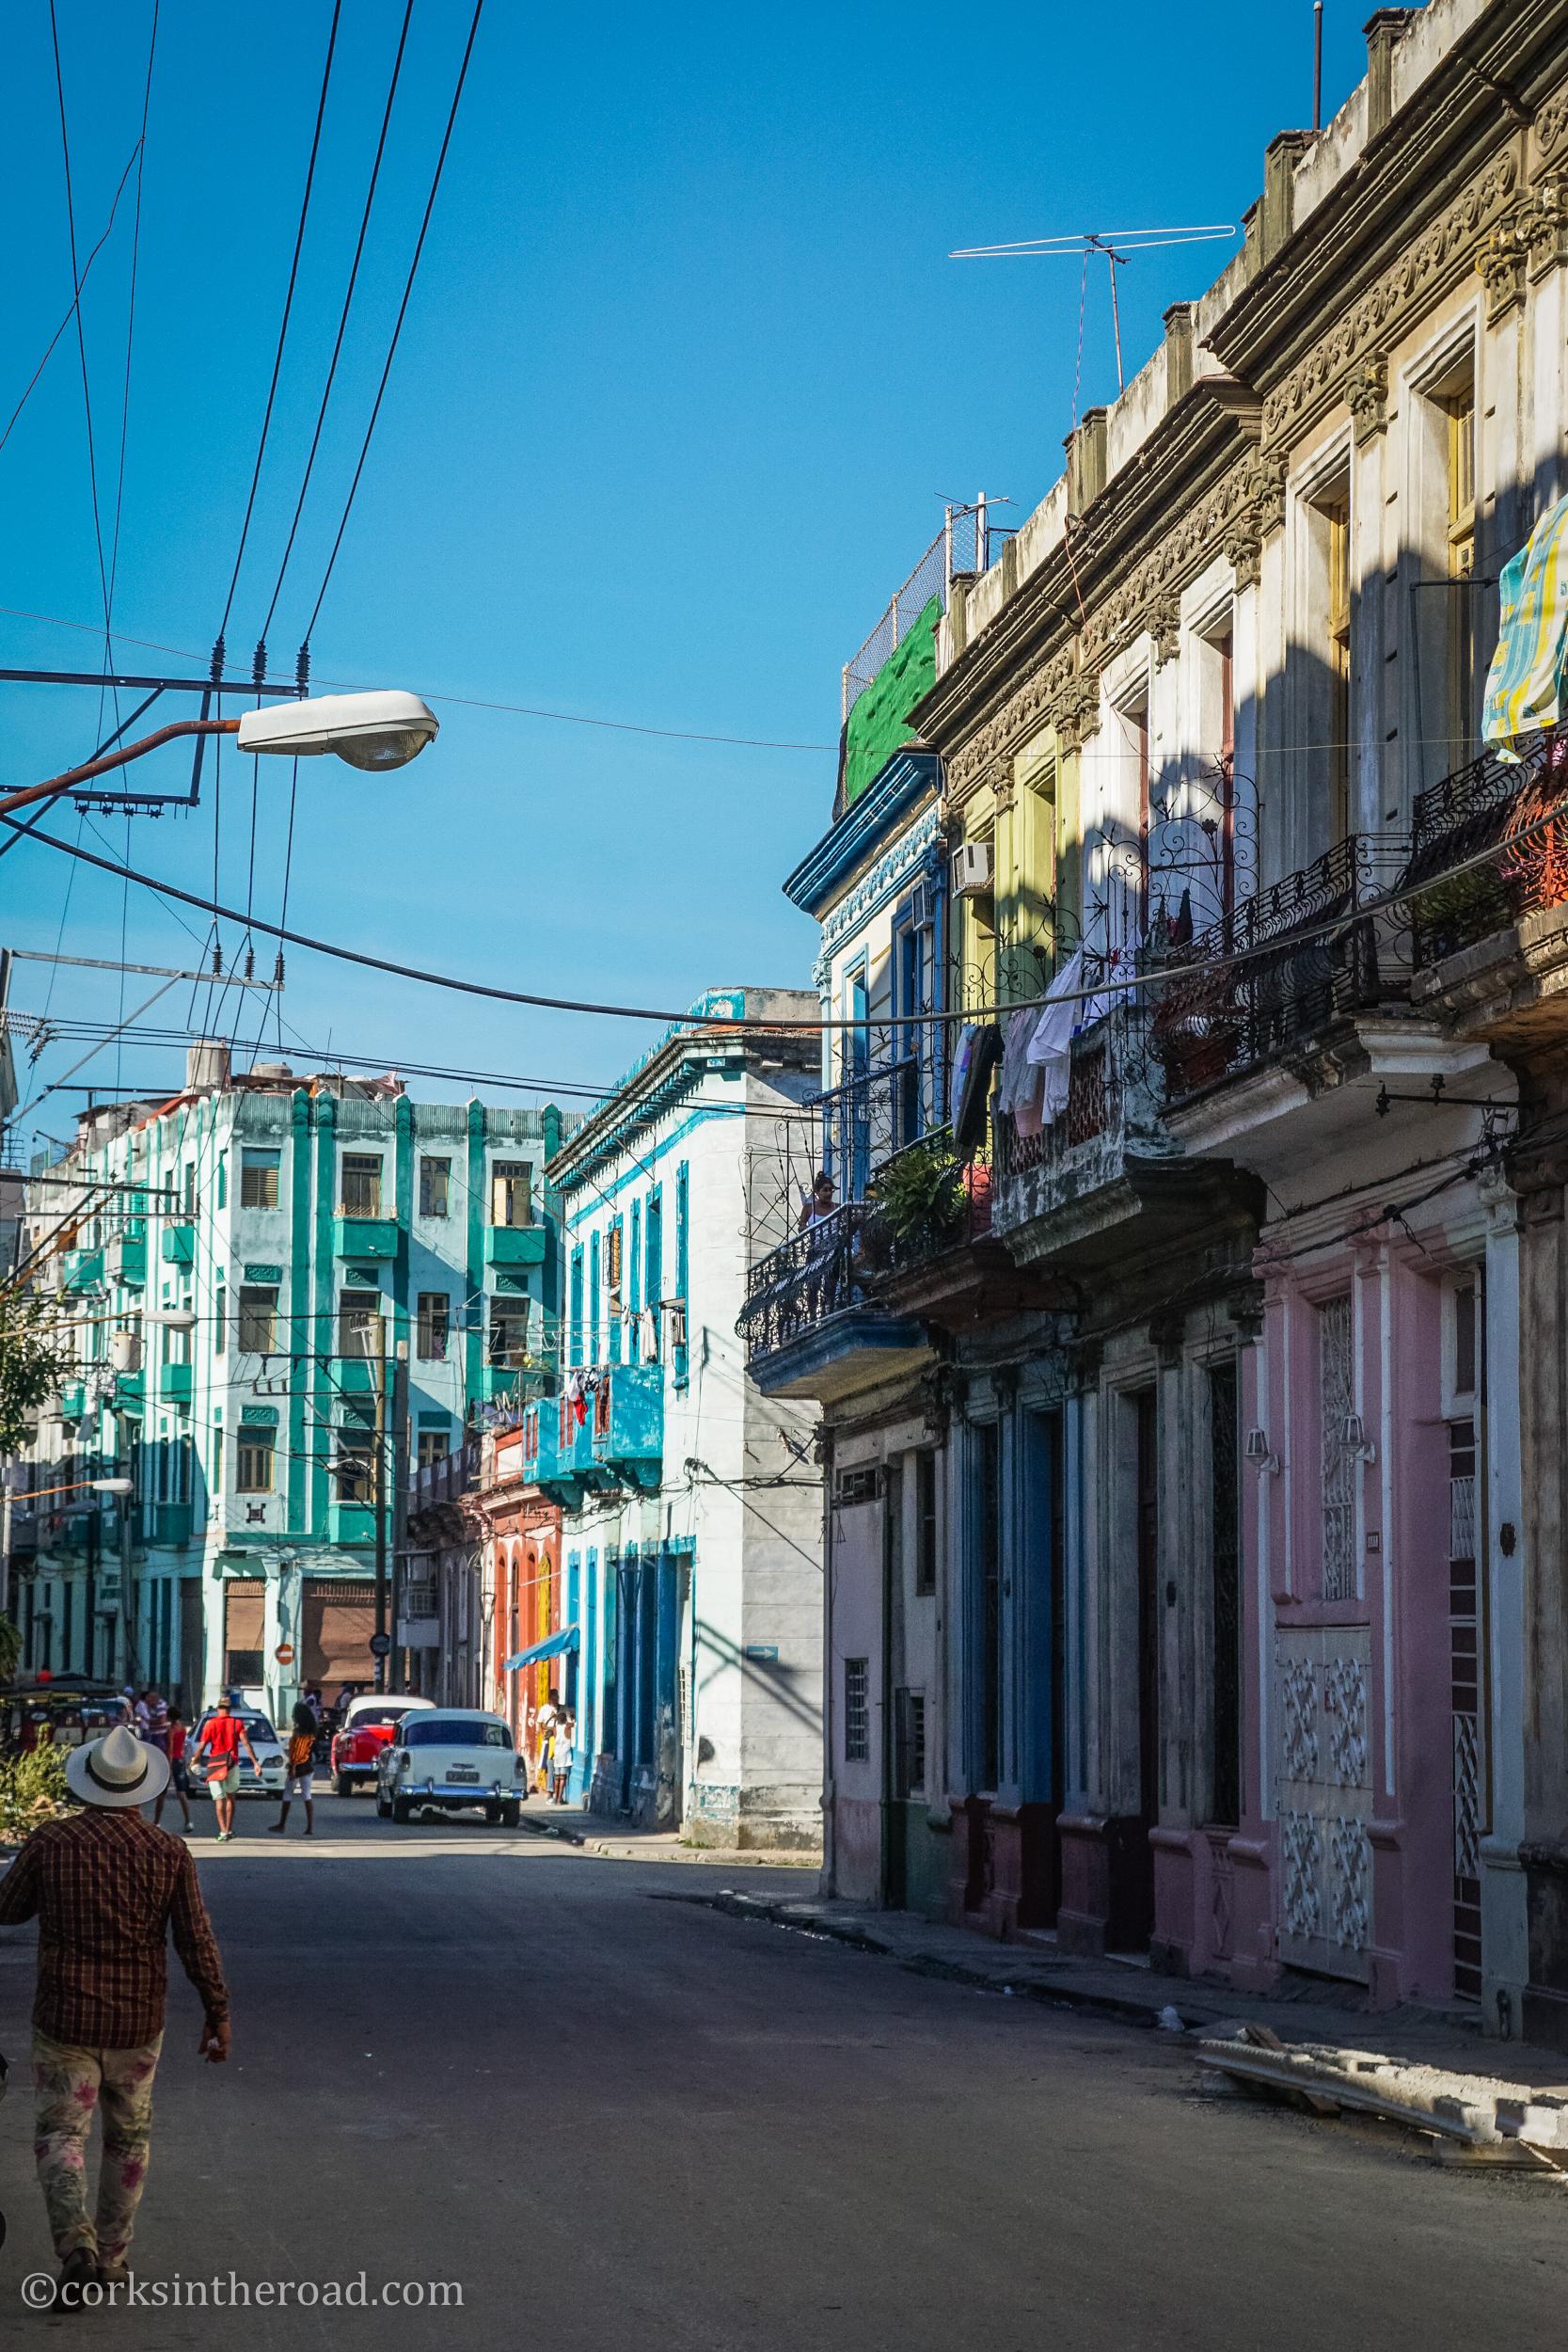 Architecture, Corksintheroad, Cuba, Havana-5.jpg